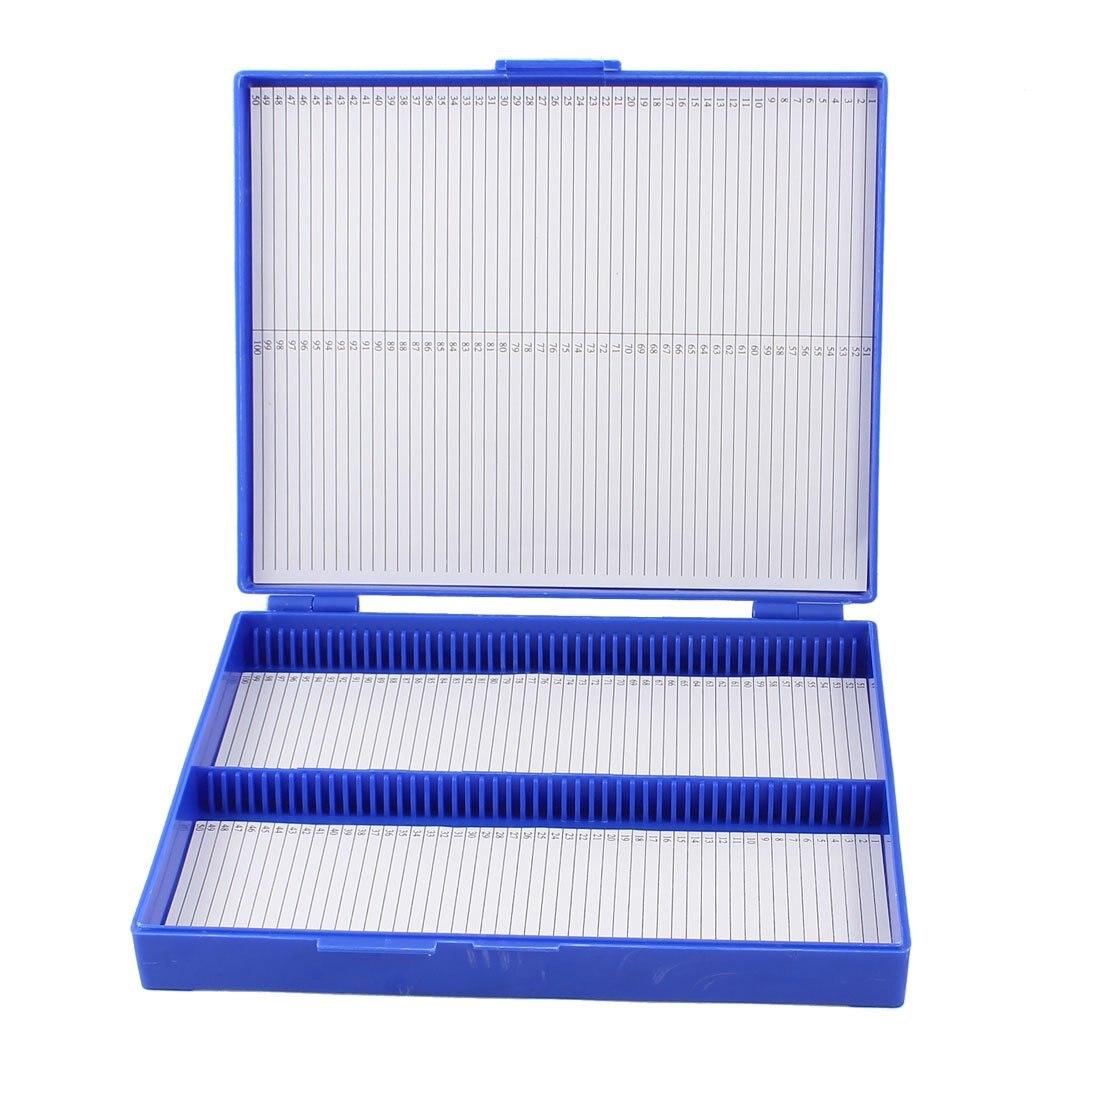 DHDL-Royal Blue Plastic Rectangle Hold 100 Microslide Slide Microscope Box